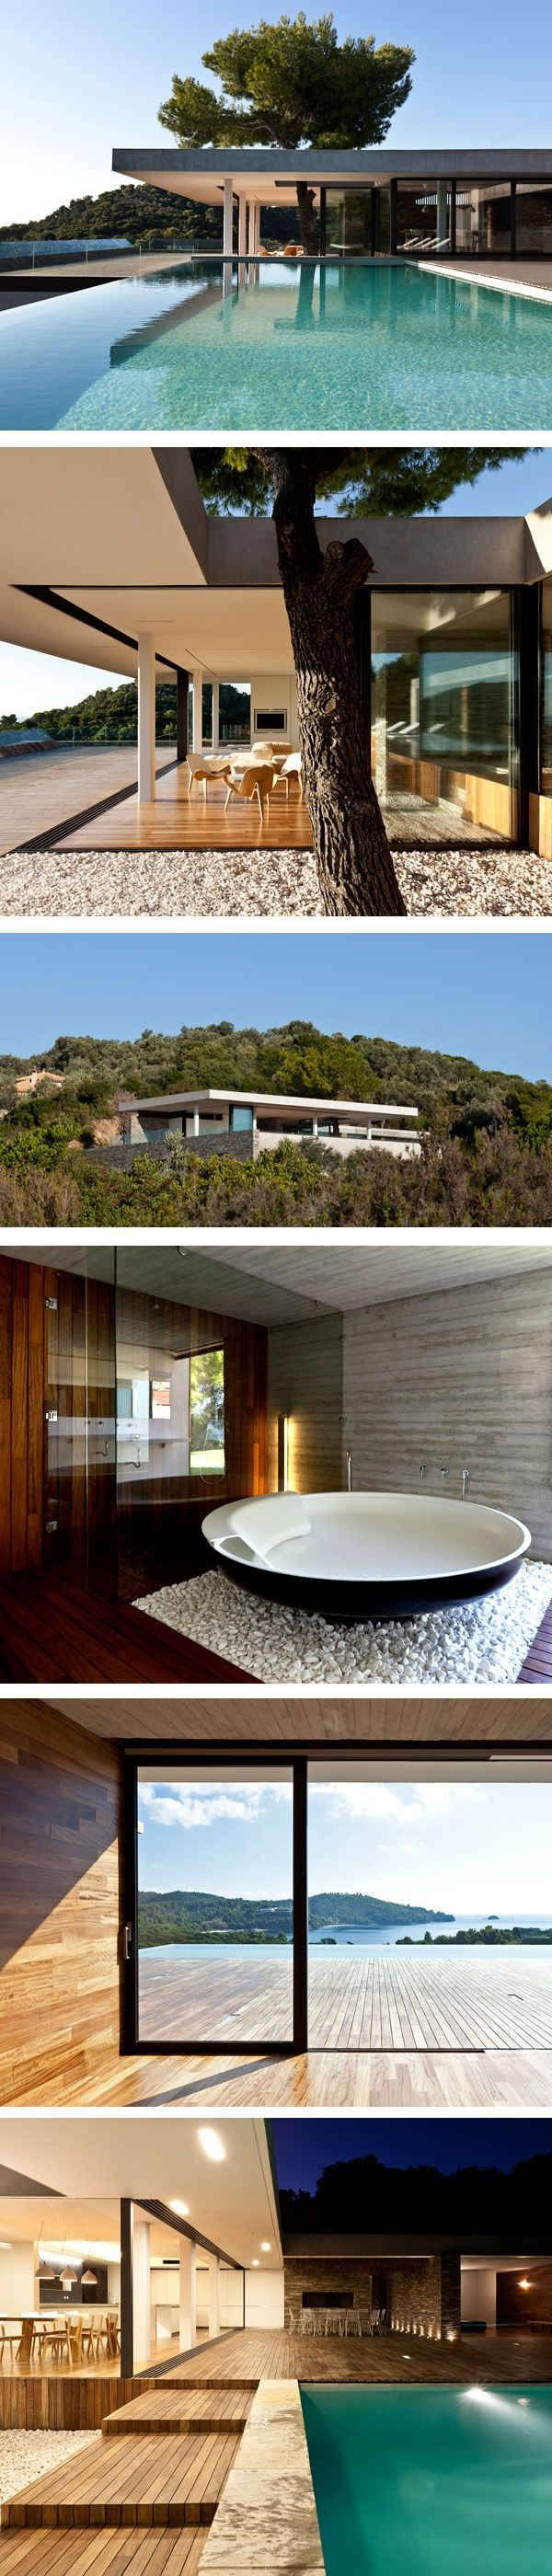 L formte modulare küche design katalog  best stylish design images on pinterest  bathroom future house